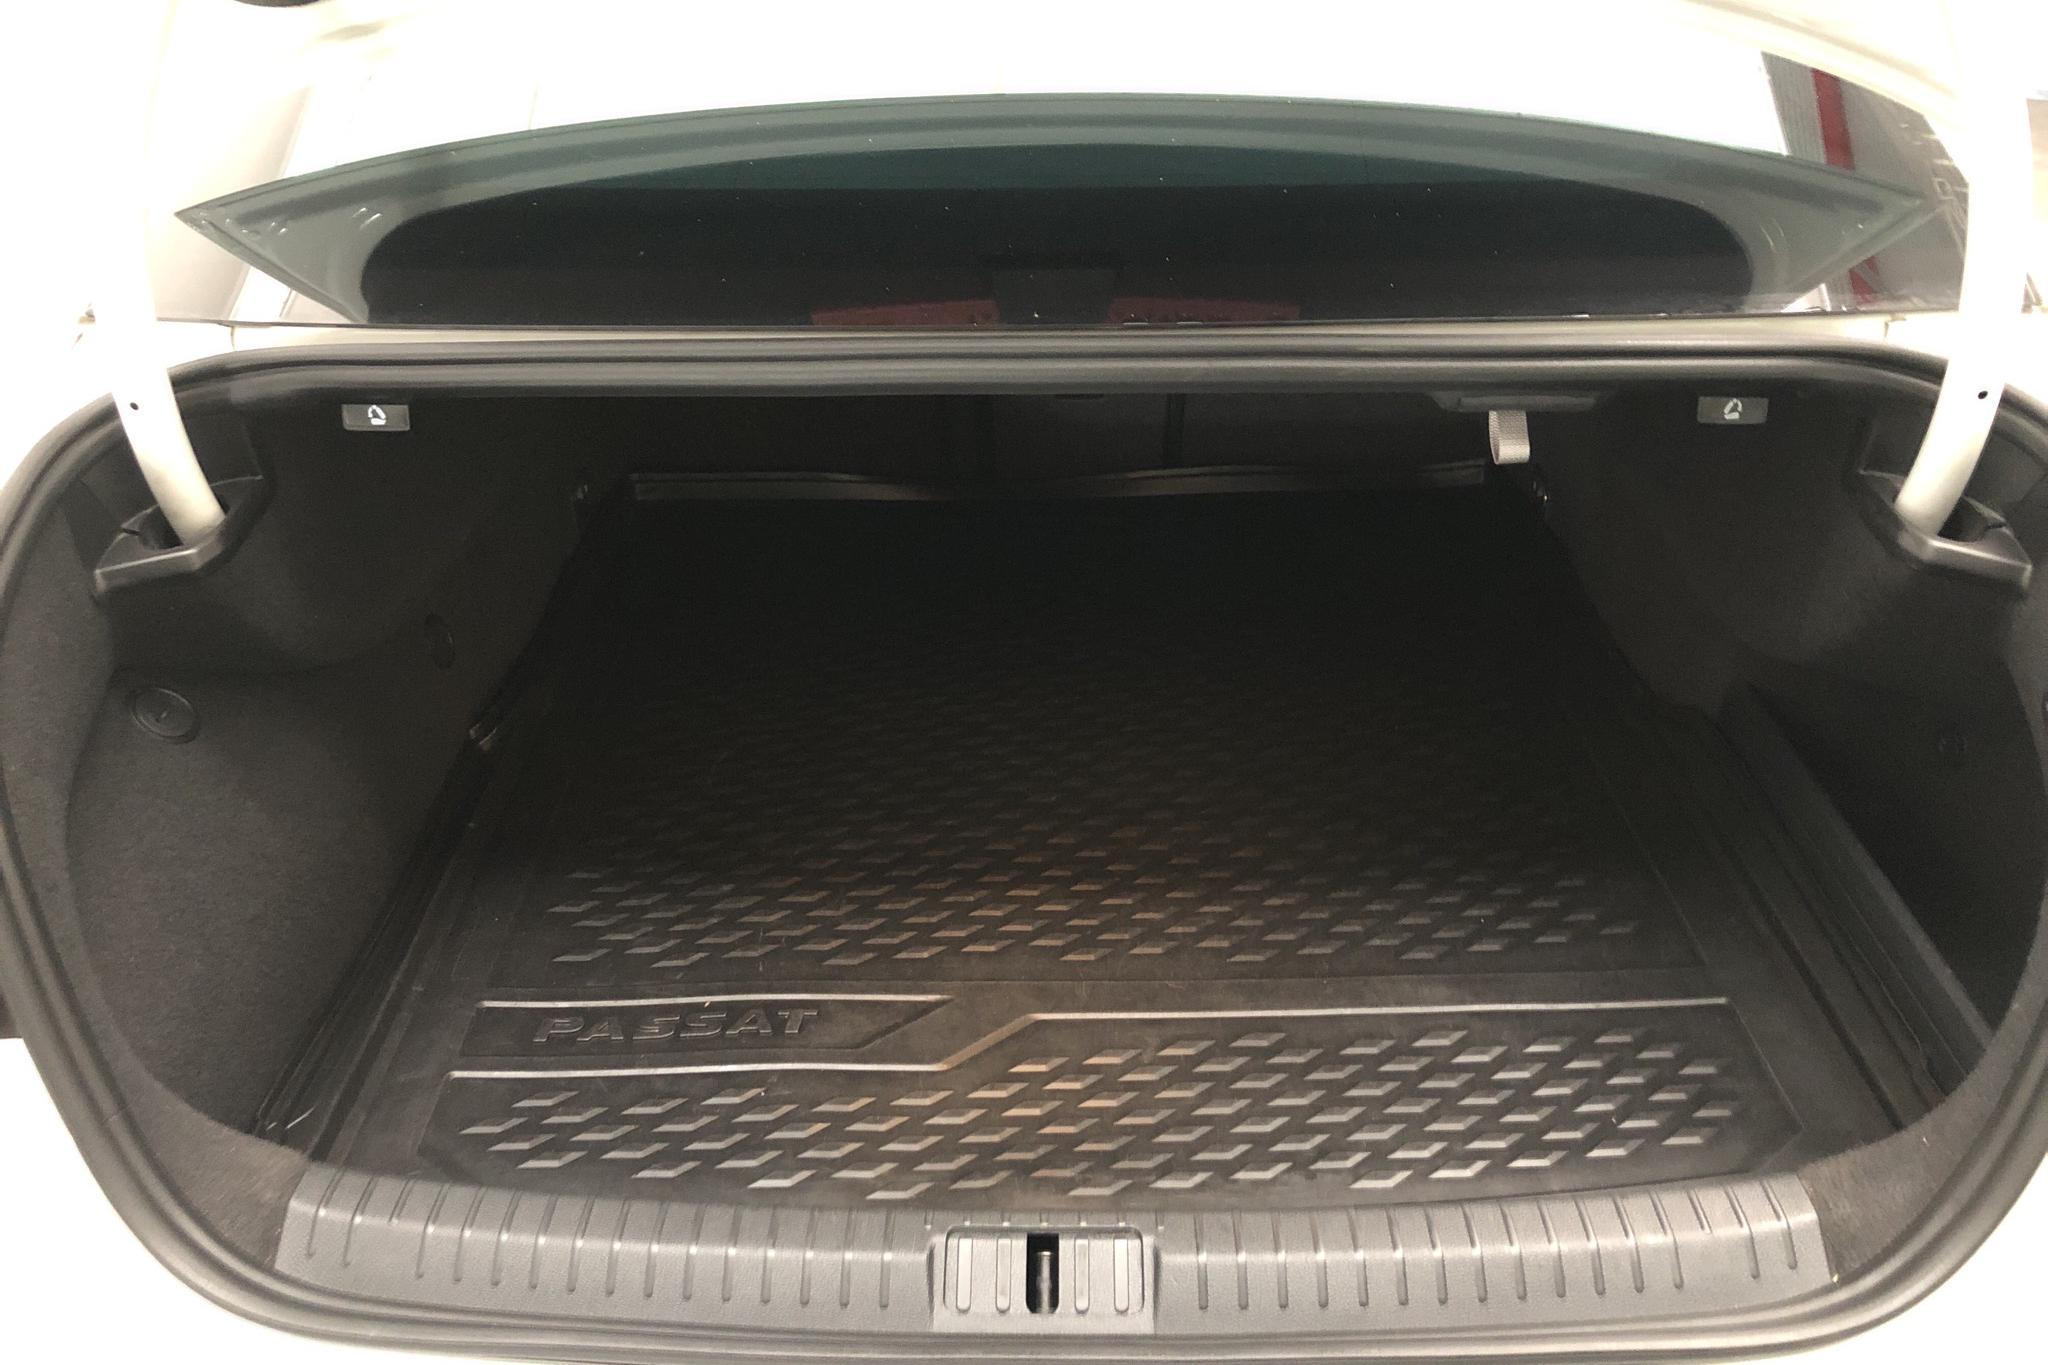 VW Passat 1.4 Plug-in-Hybrid (218hk) - 132 210 km - Automatic - white - 2017